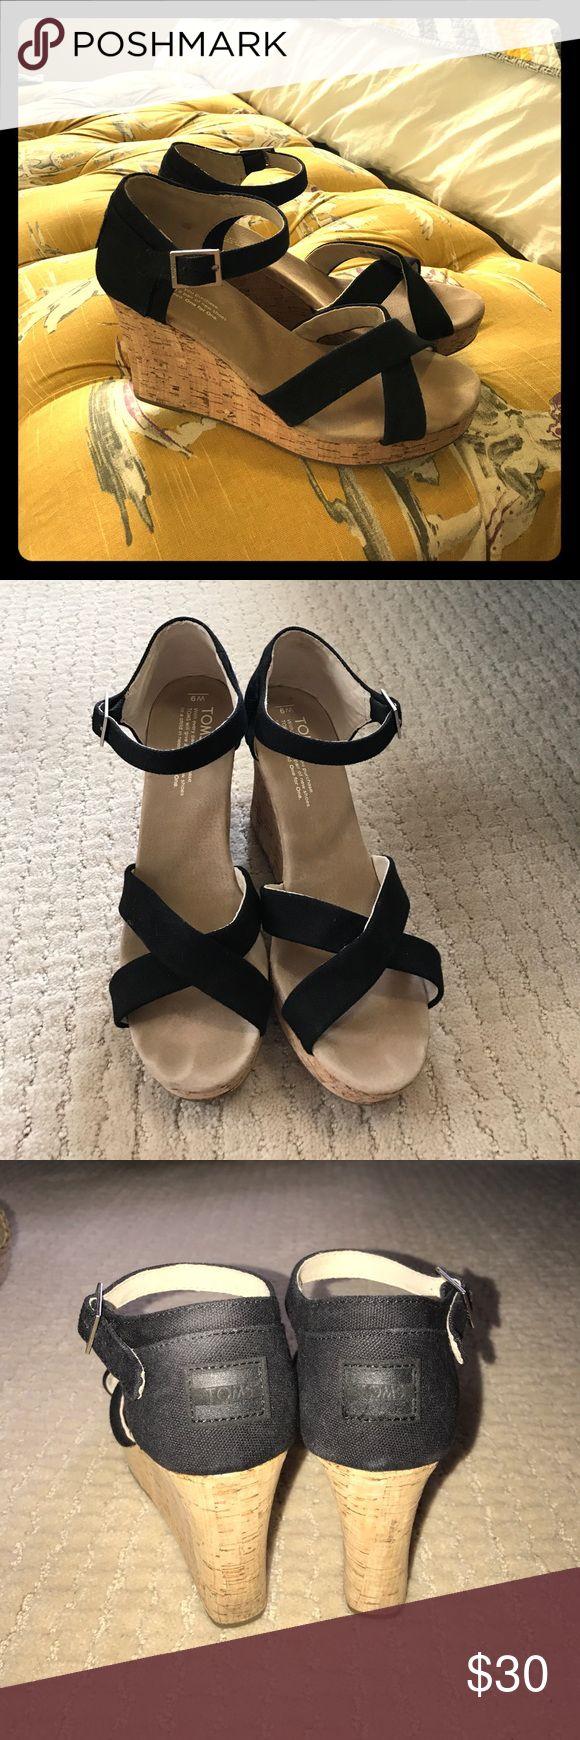 Toms black cork wedges Adorable black wedges. Gently used. 1 inch platform and 4 inch heel Toms Shoes Wedges